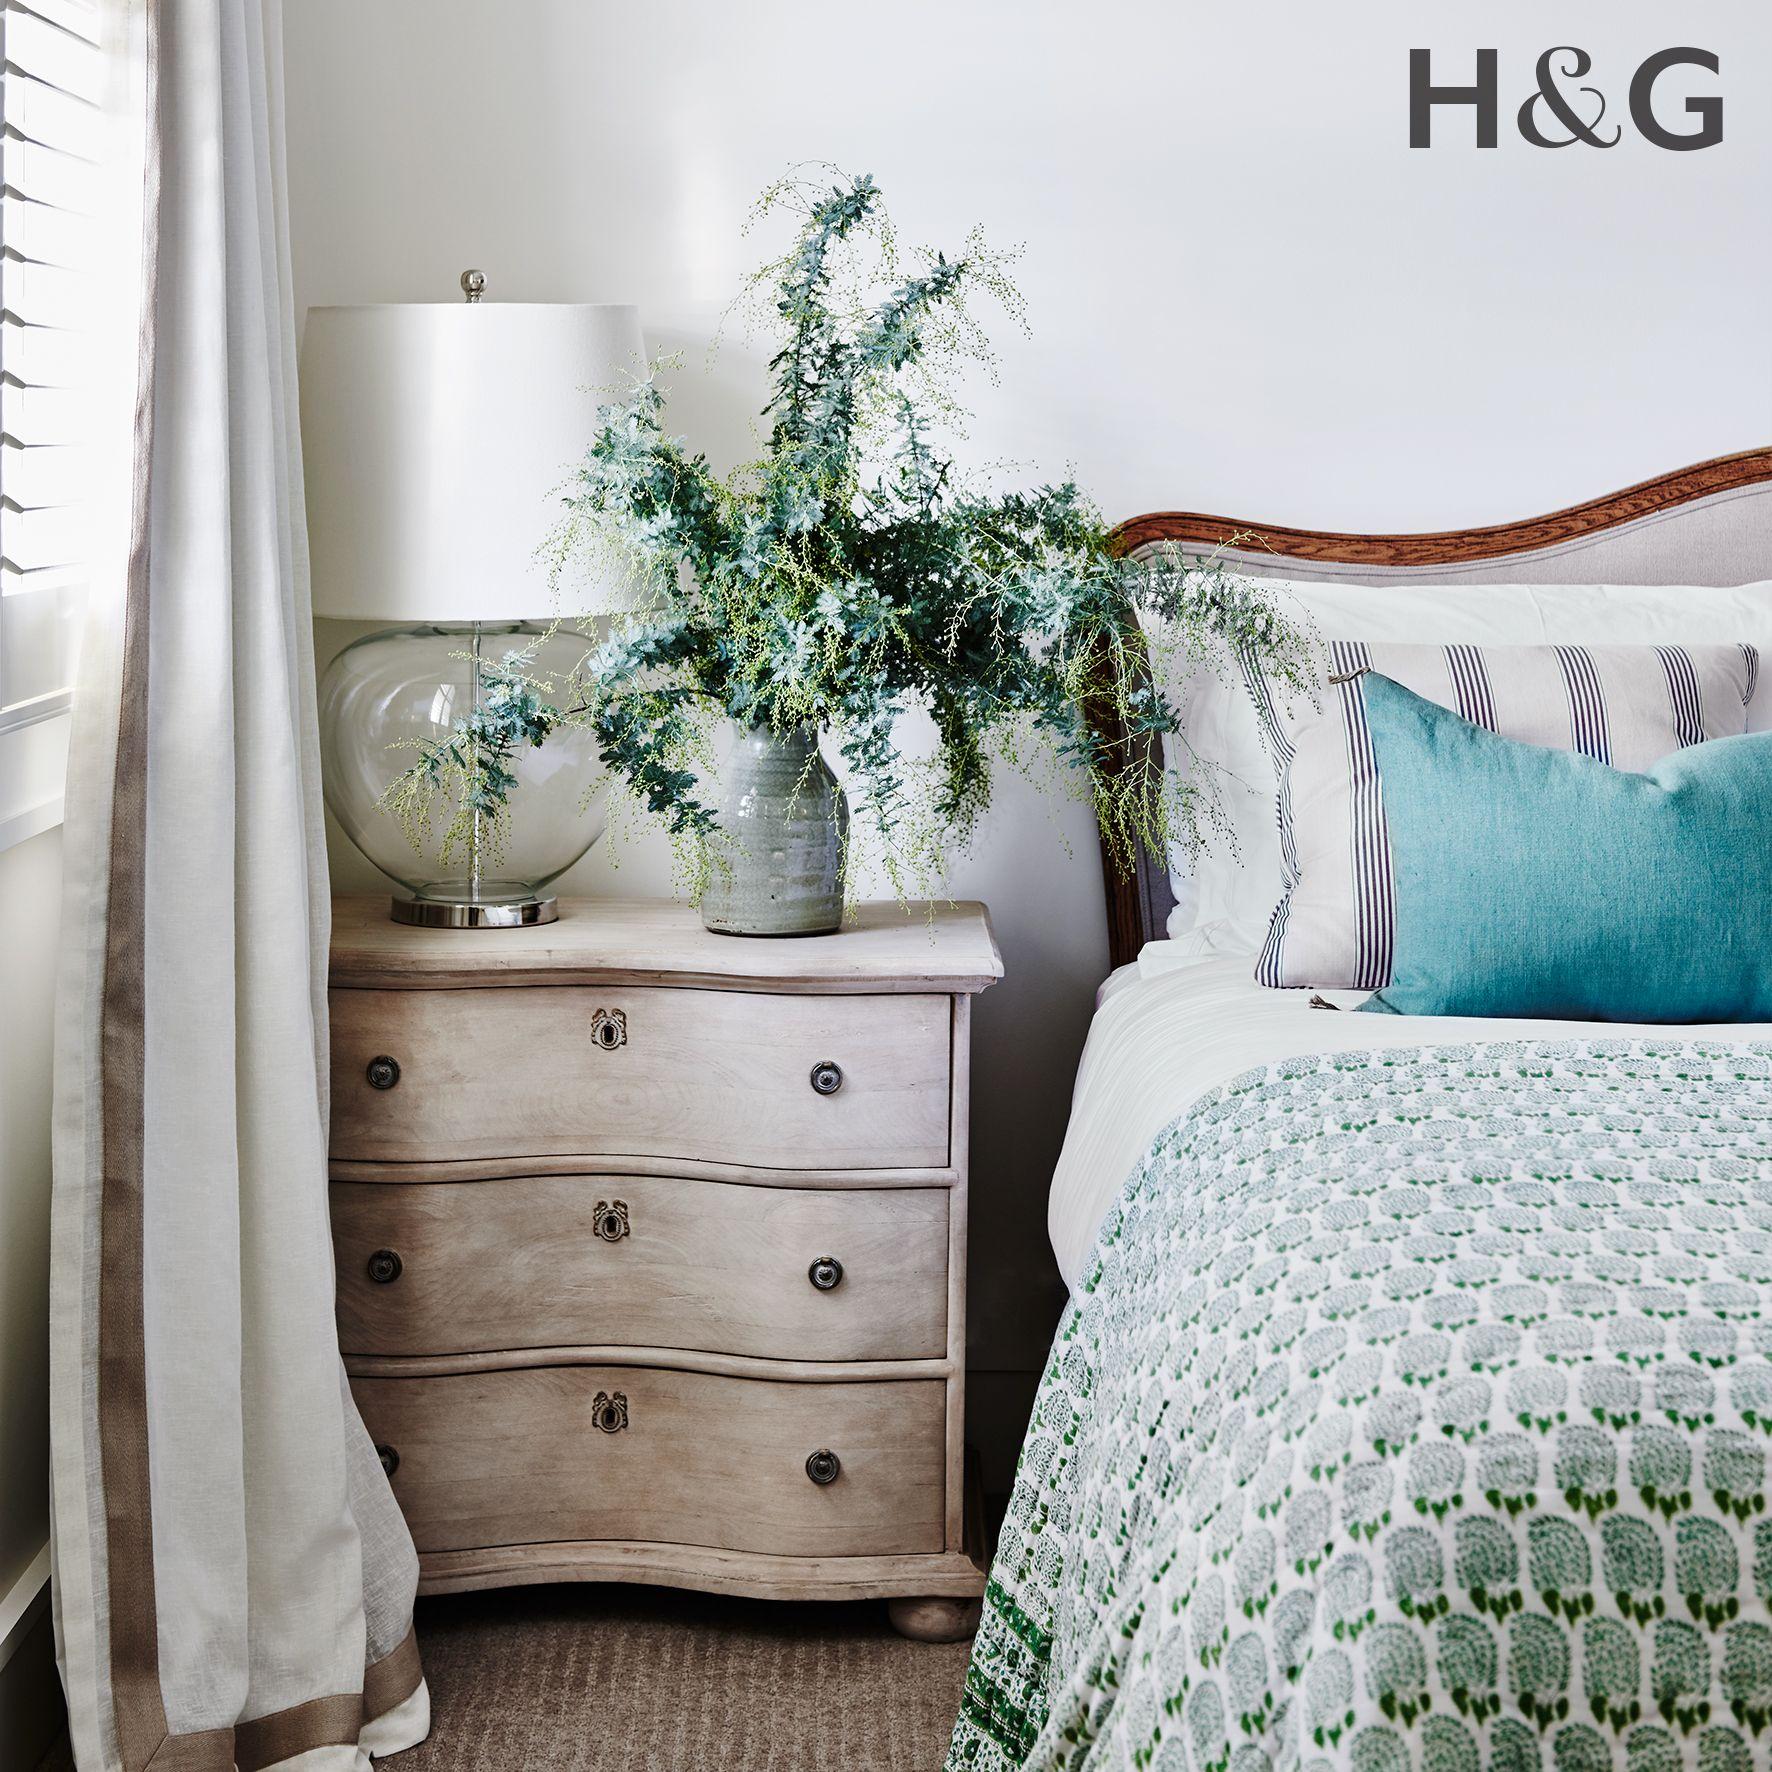 Hamptons Inspired Luxury Home Master Bedroom Robeson: Bedroom Details From Australian House & Garden Magazine